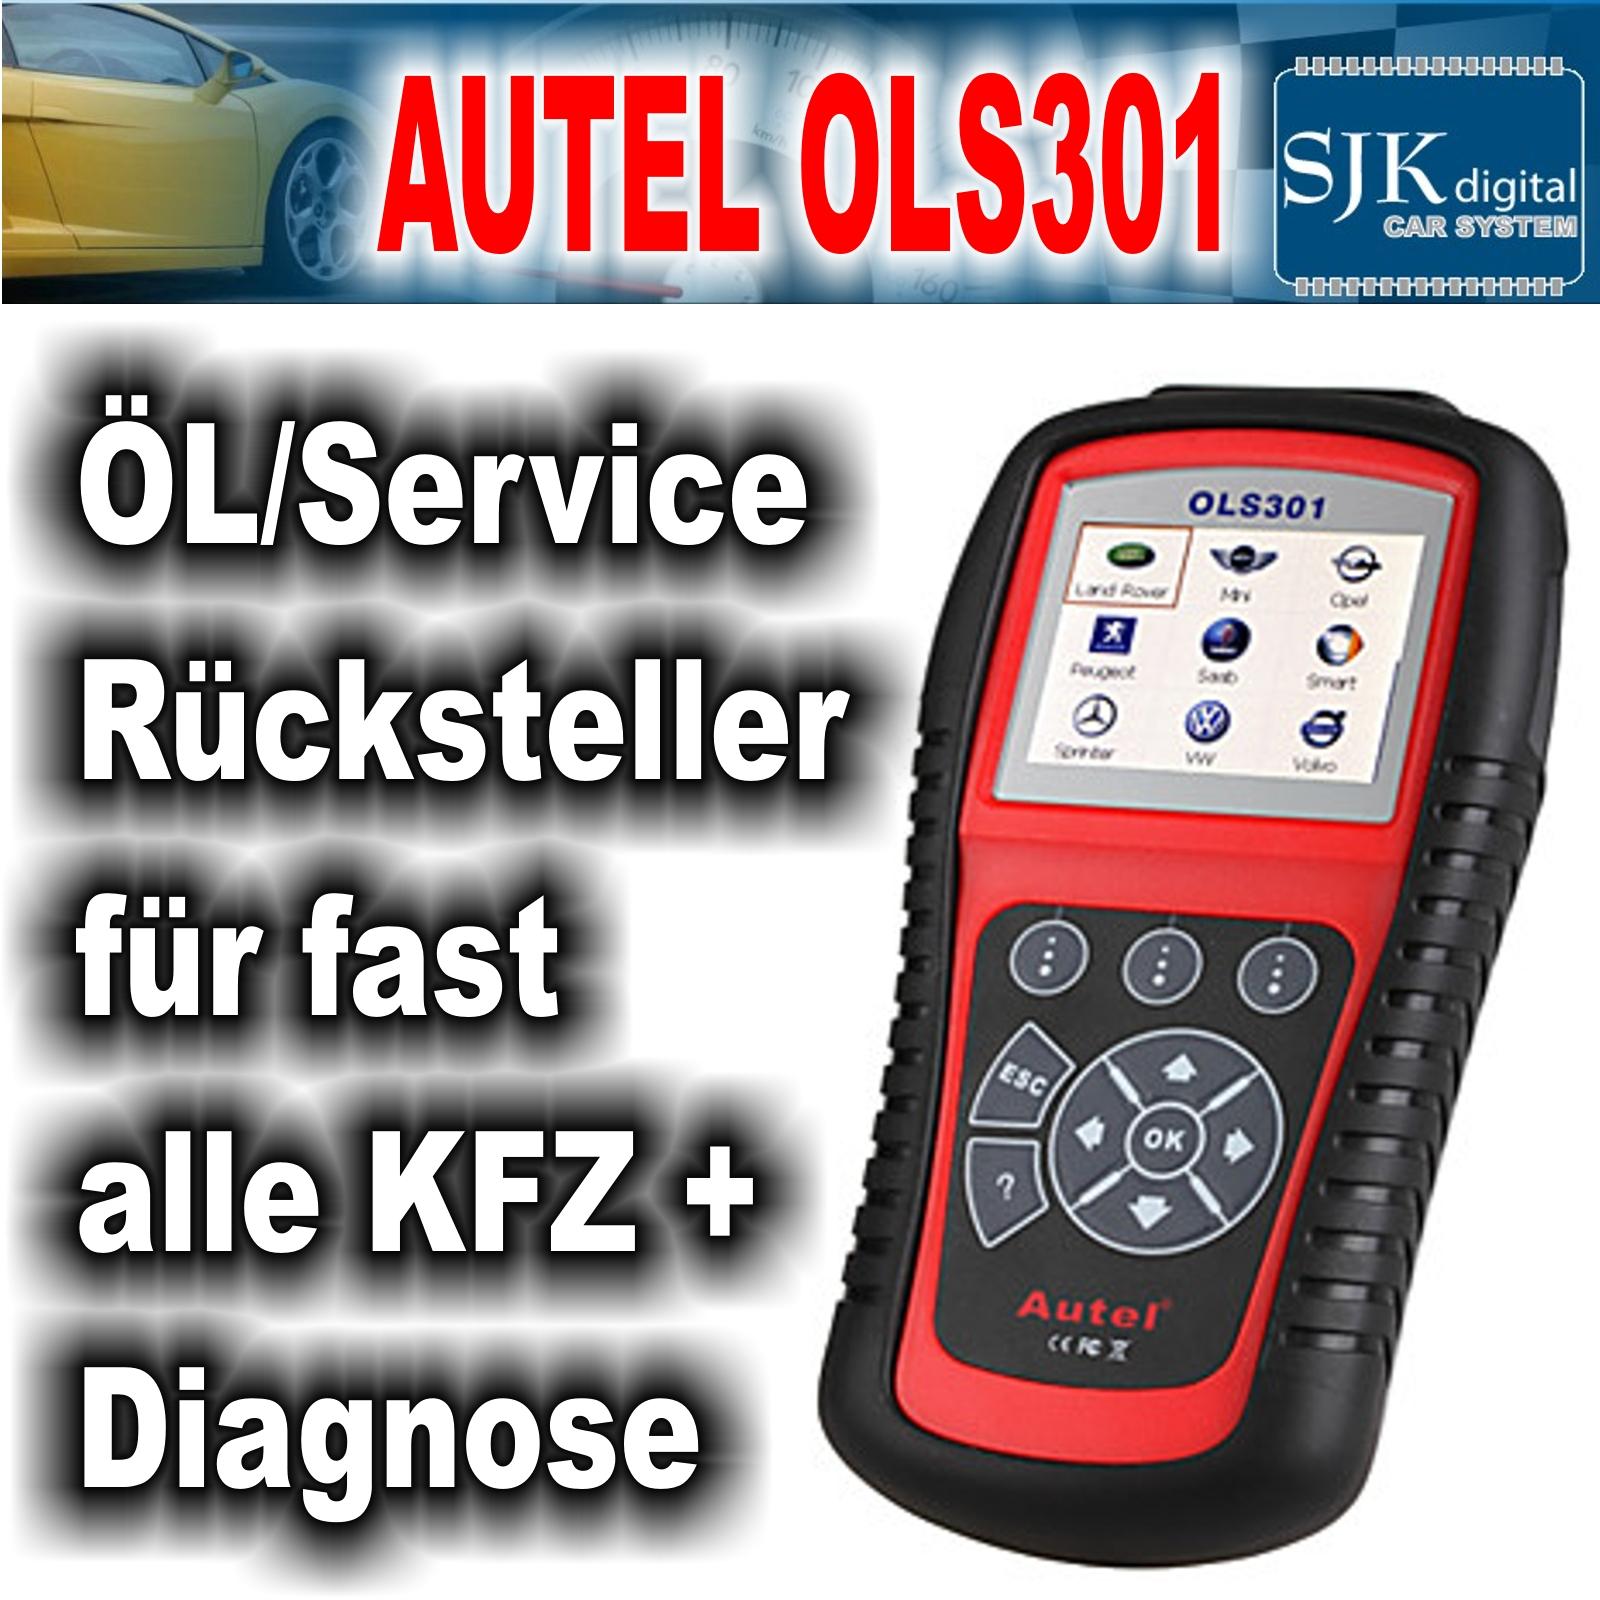 LAUNCH CR701 Öl /& Service Rücksteller für fast alle KFZ /& Diagnose